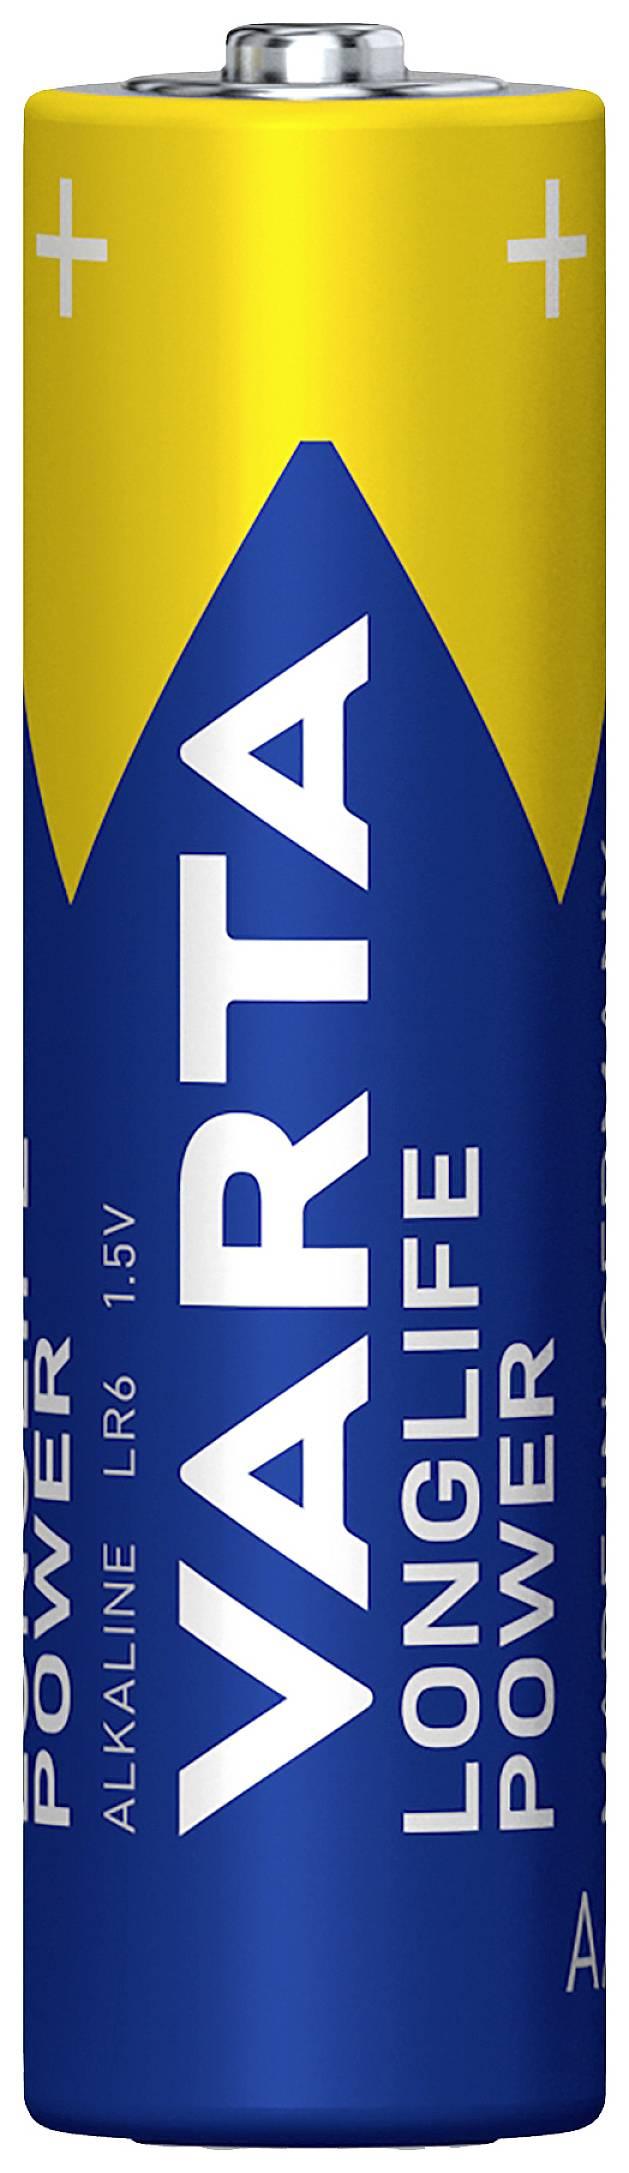 Alkalická/manganová baterie Varta High Energy, typ AA, 4 ks